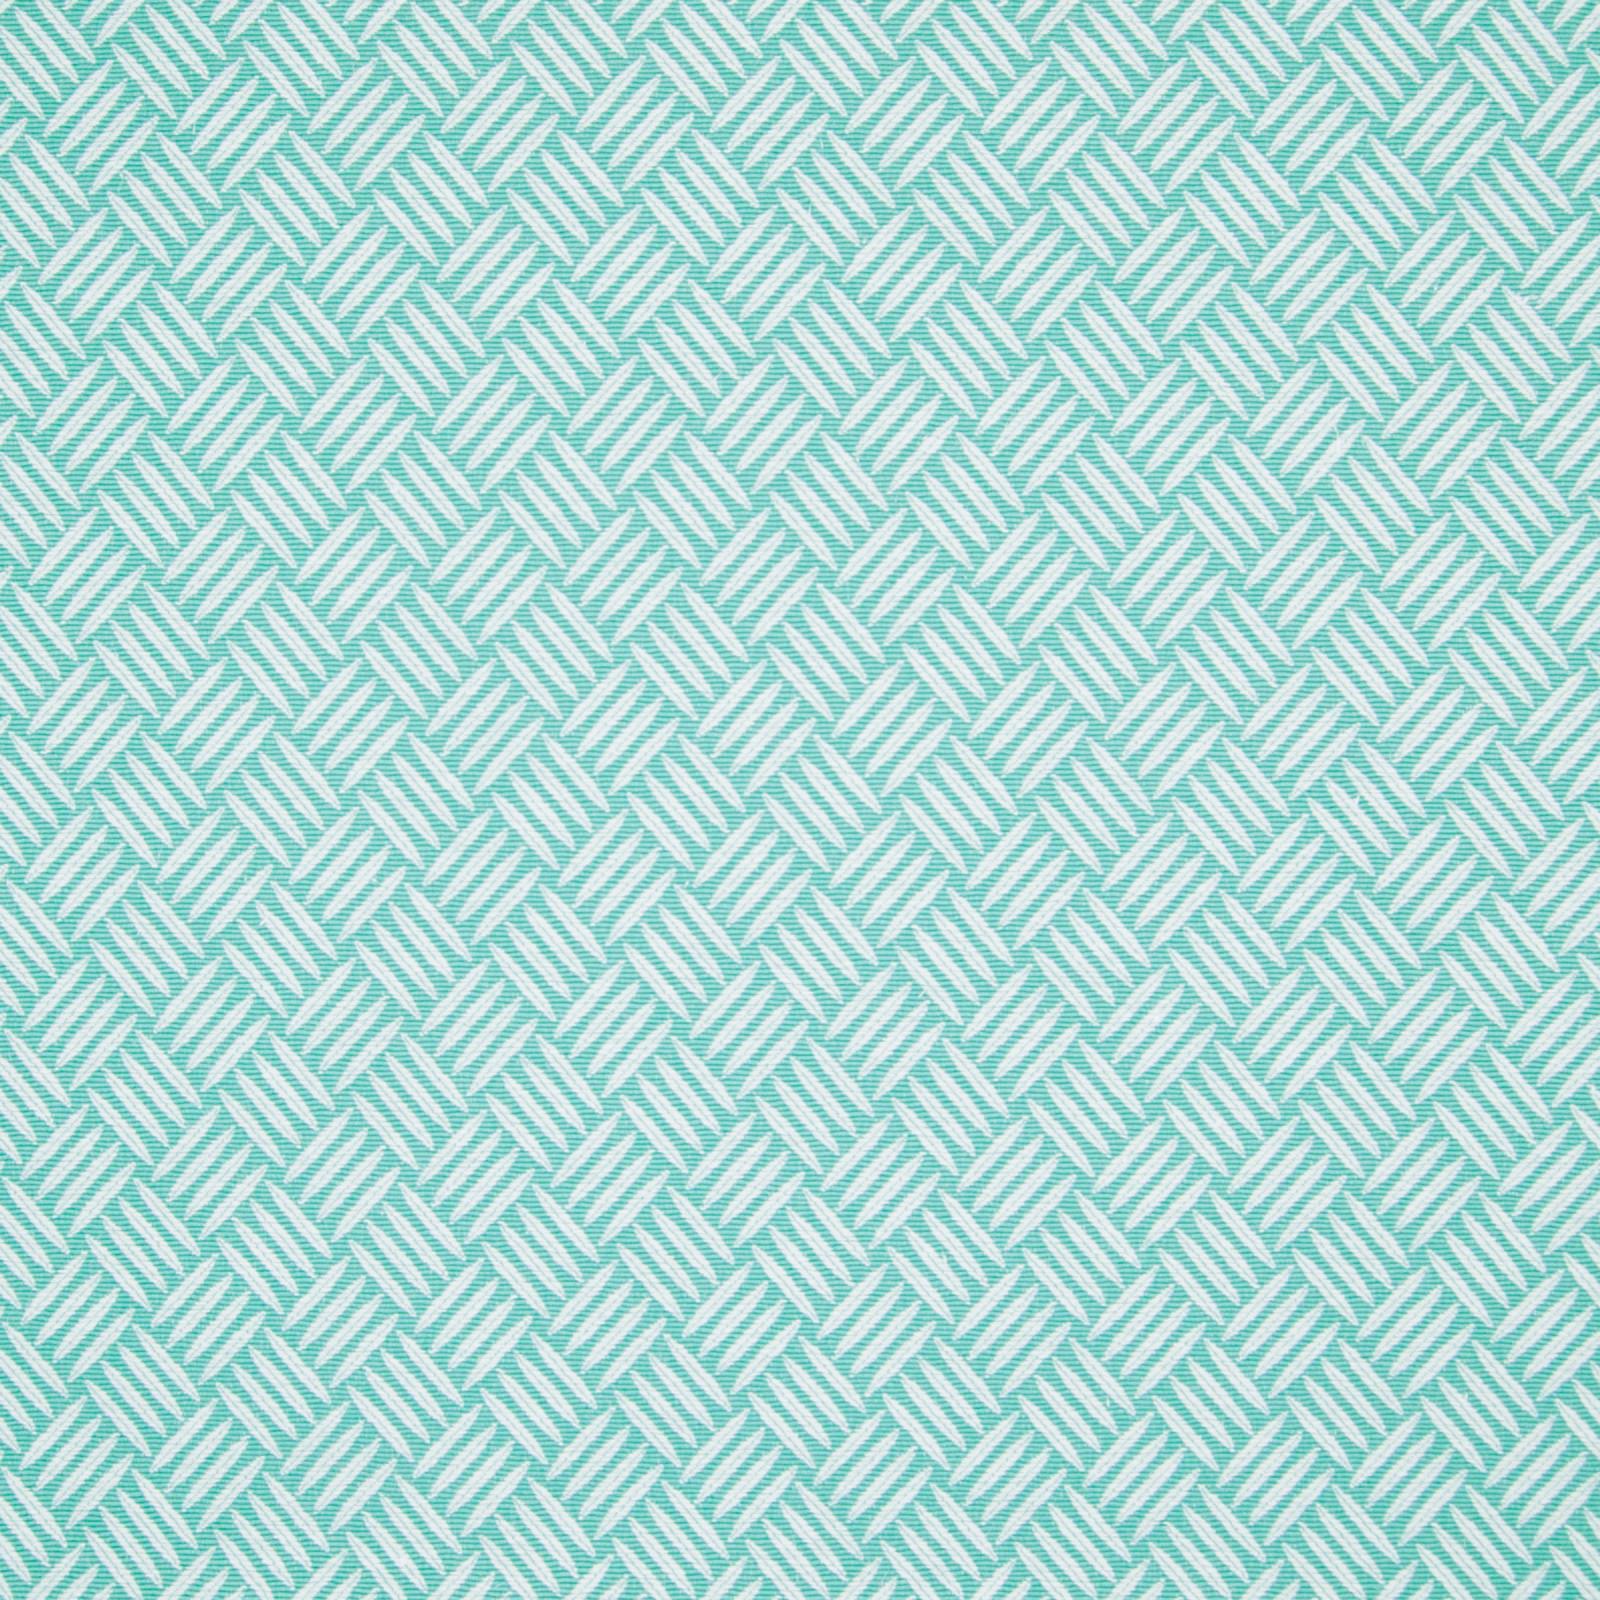 B3038 Turquoise Greenhouse Fabrics